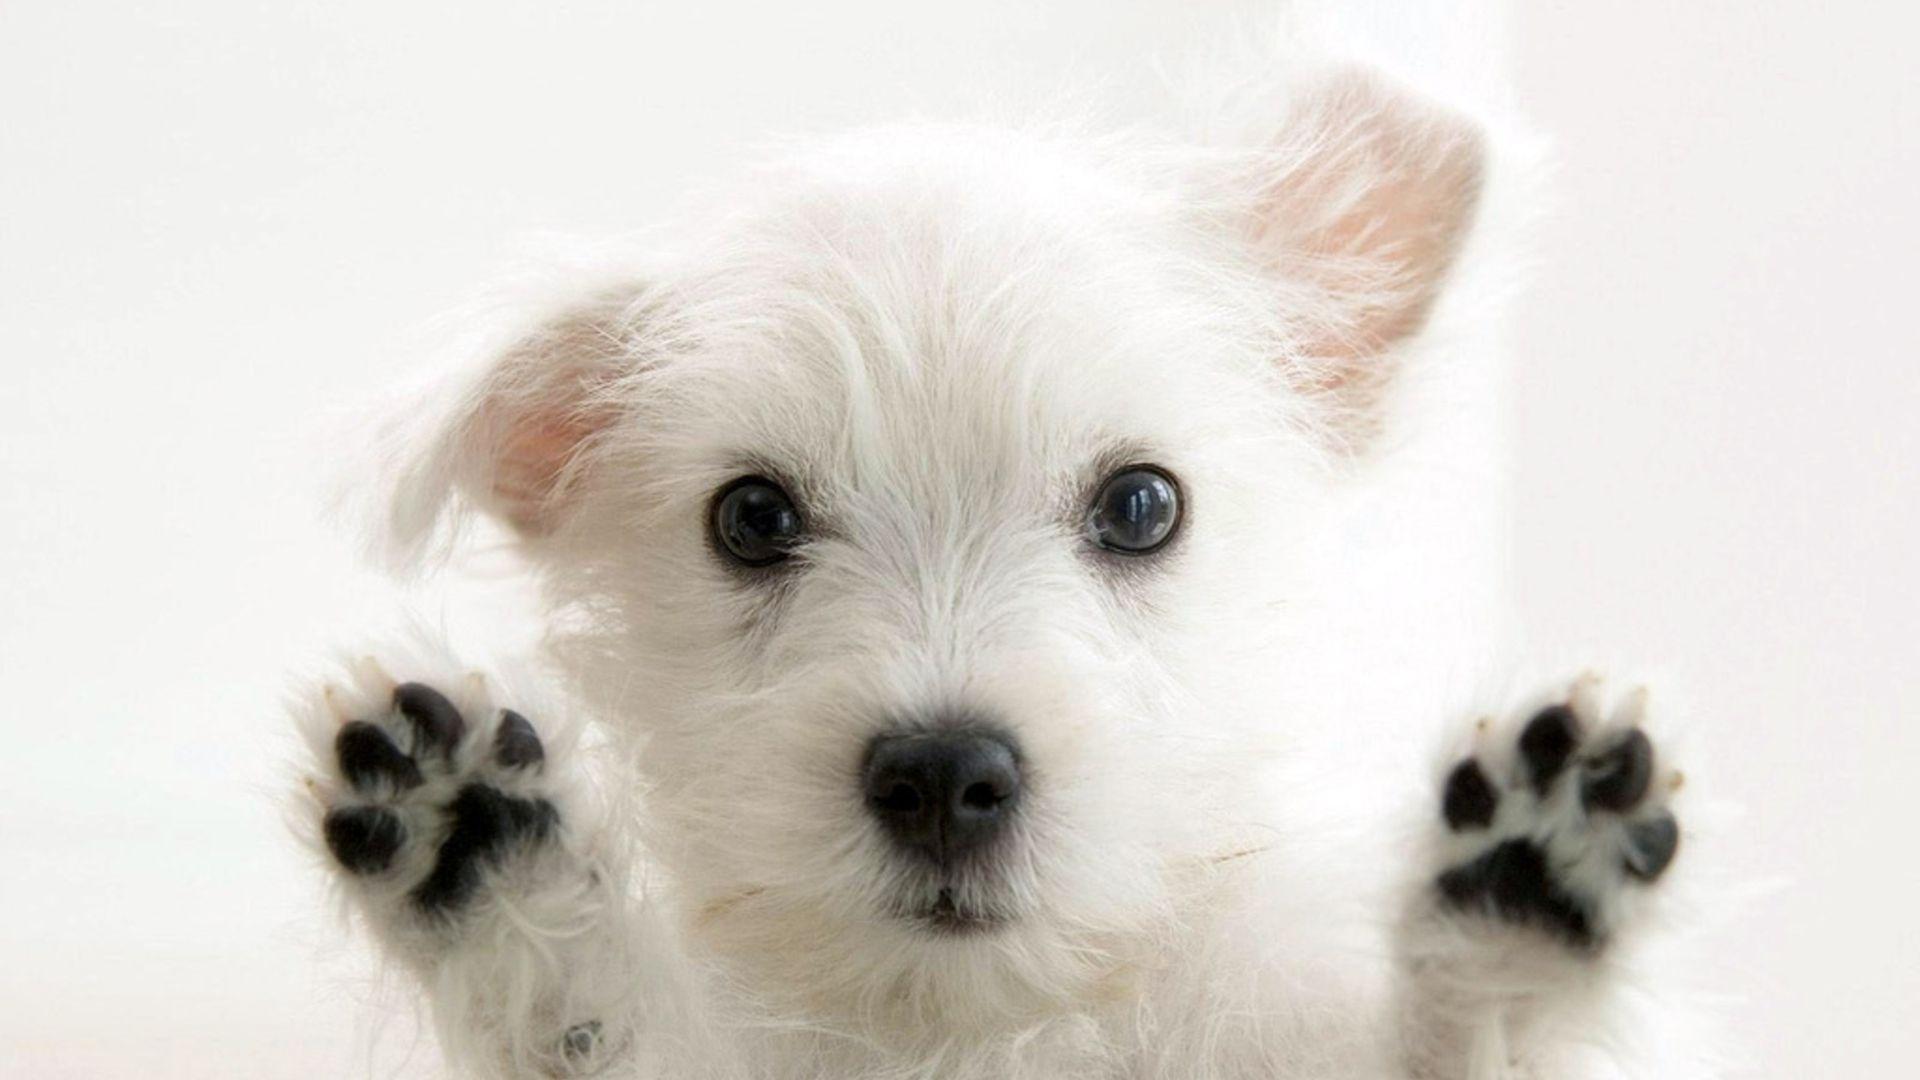 Pupee West Highland White Terrier Puppy X Animal 1920x1080 Hd Wallpaper Poupeegirl France Son Michel Polnare Cute White Dogs Very Cute Dogs Westie Puppies